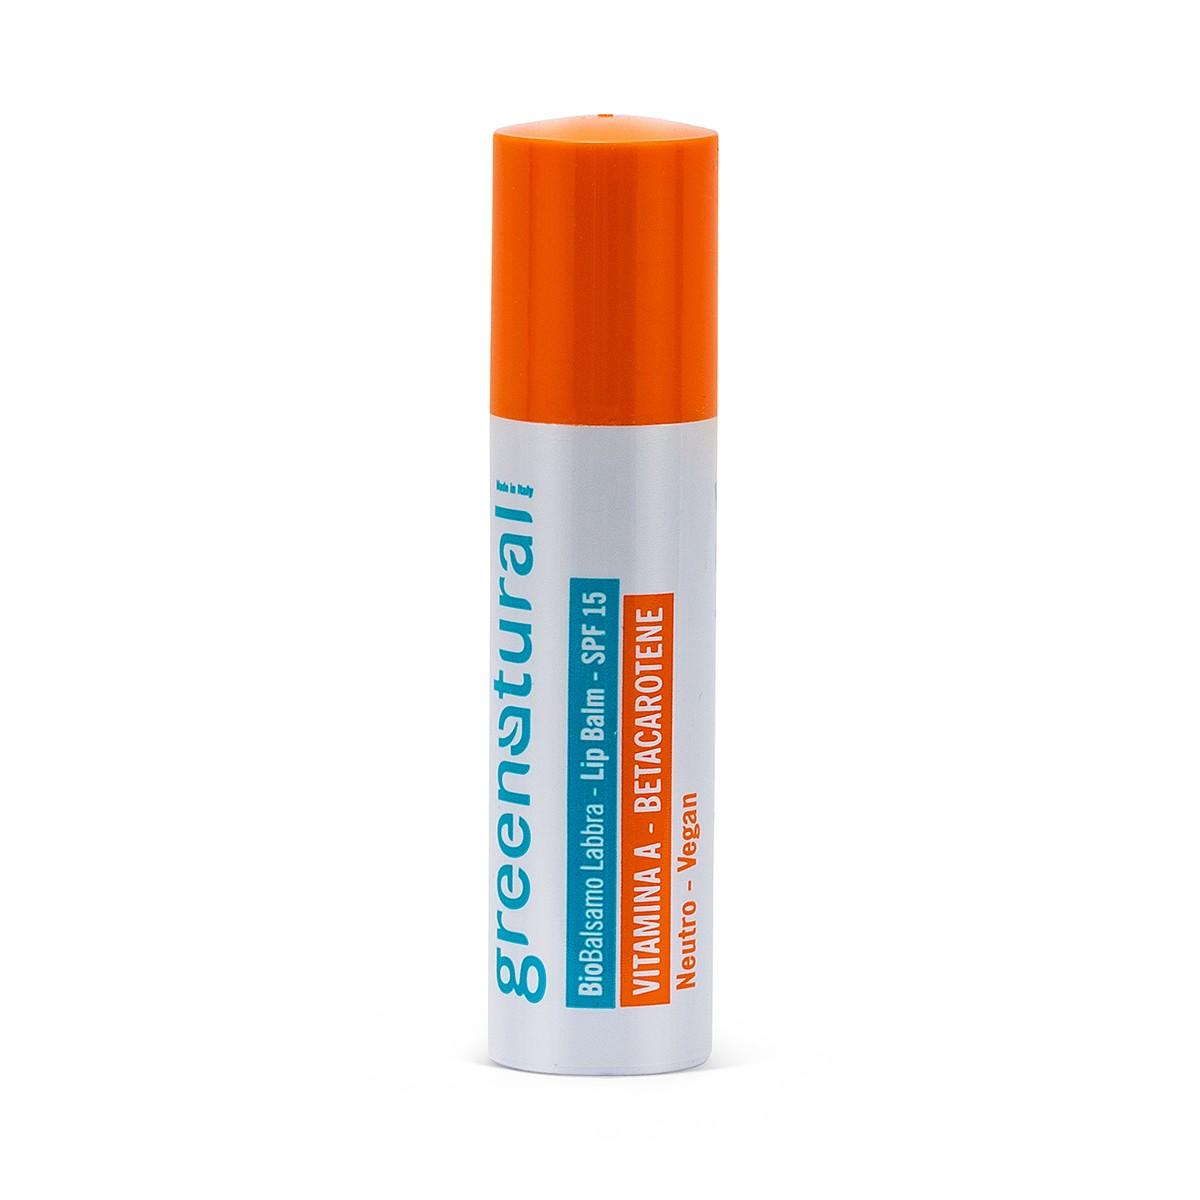 Balsamo Labbra Stick Alla Vitamina A – Spf 15